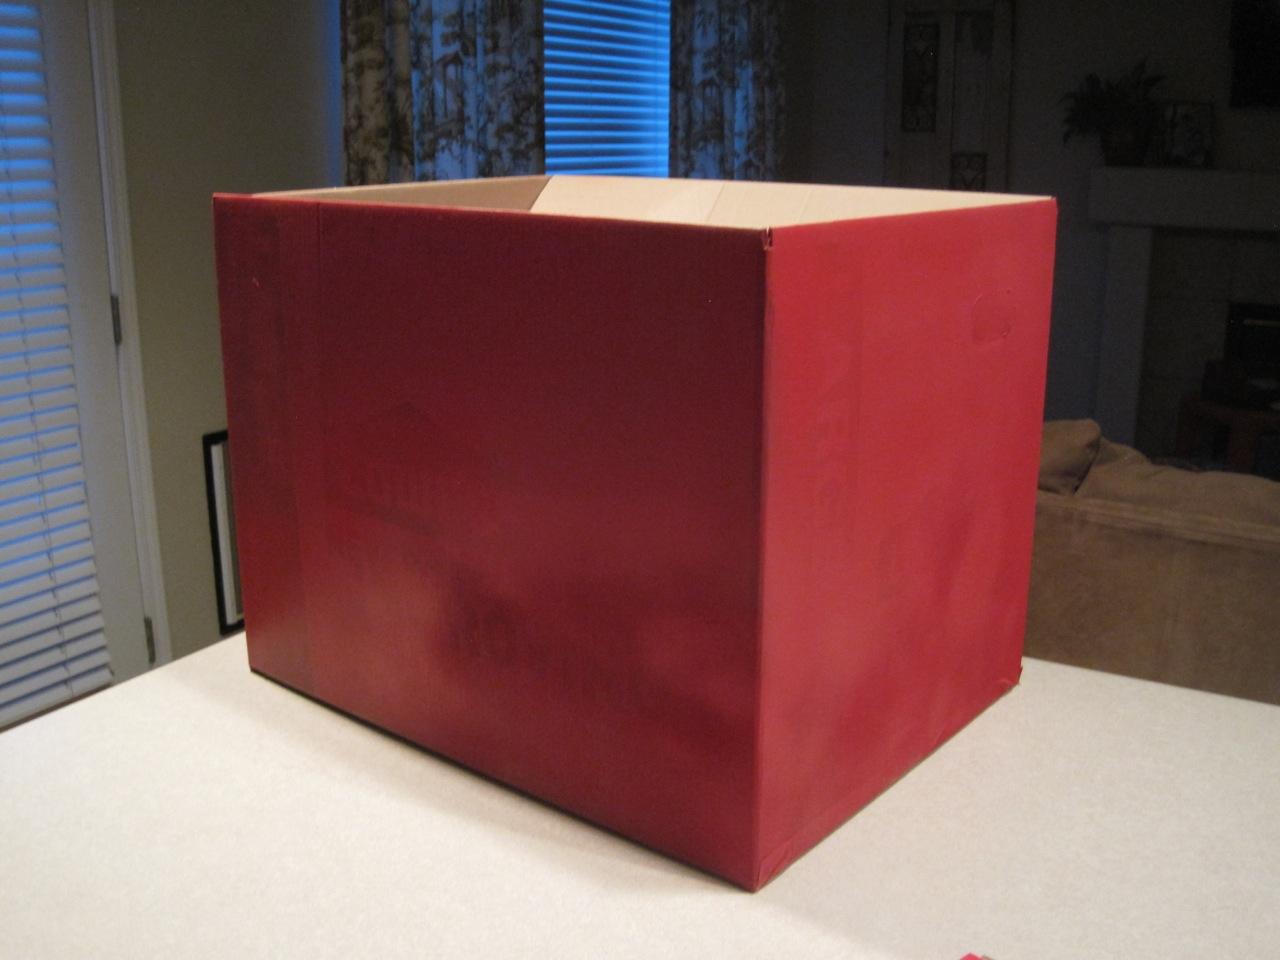 spray painted box. Black Bedroom Furniture Sets. Home Design Ideas